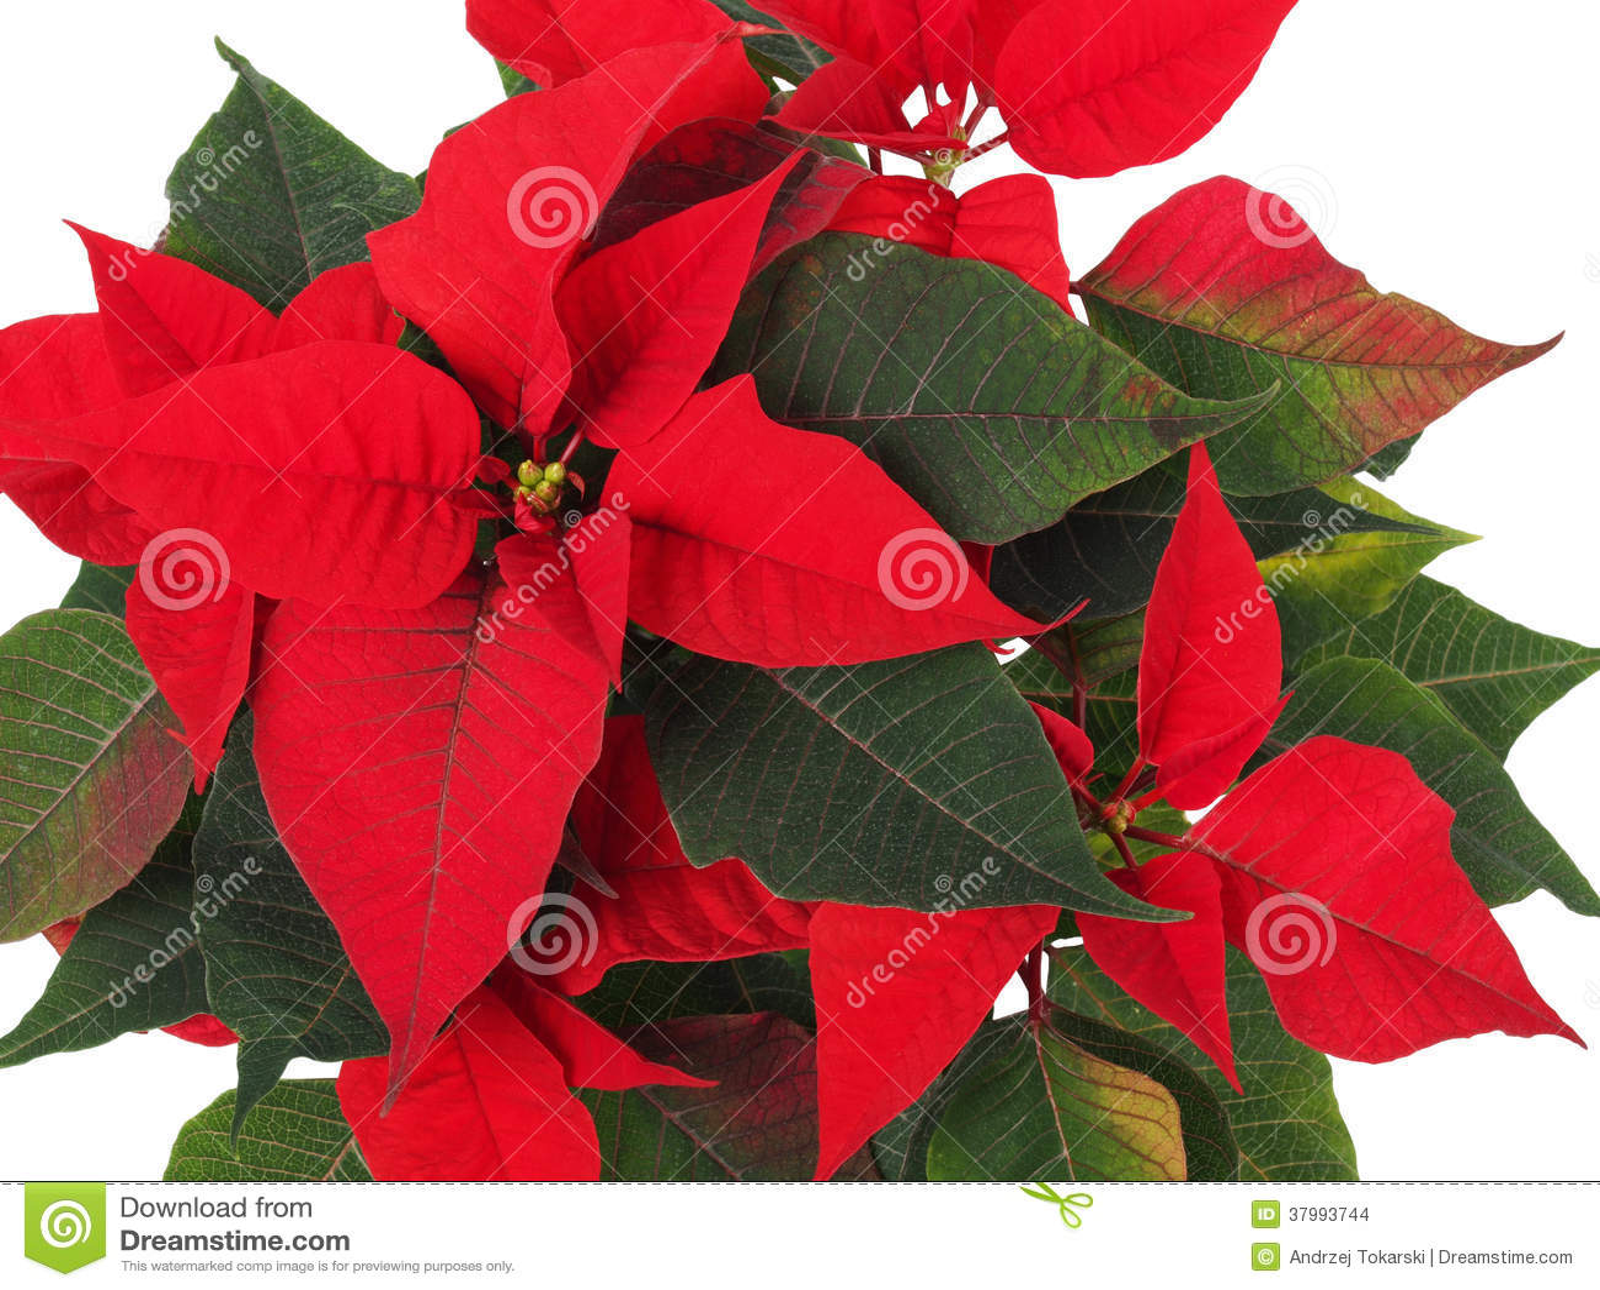 weihnachtsstern blume poinsettia stockbilder bild 37993744. Black Bedroom Furniture Sets. Home Design Ideas